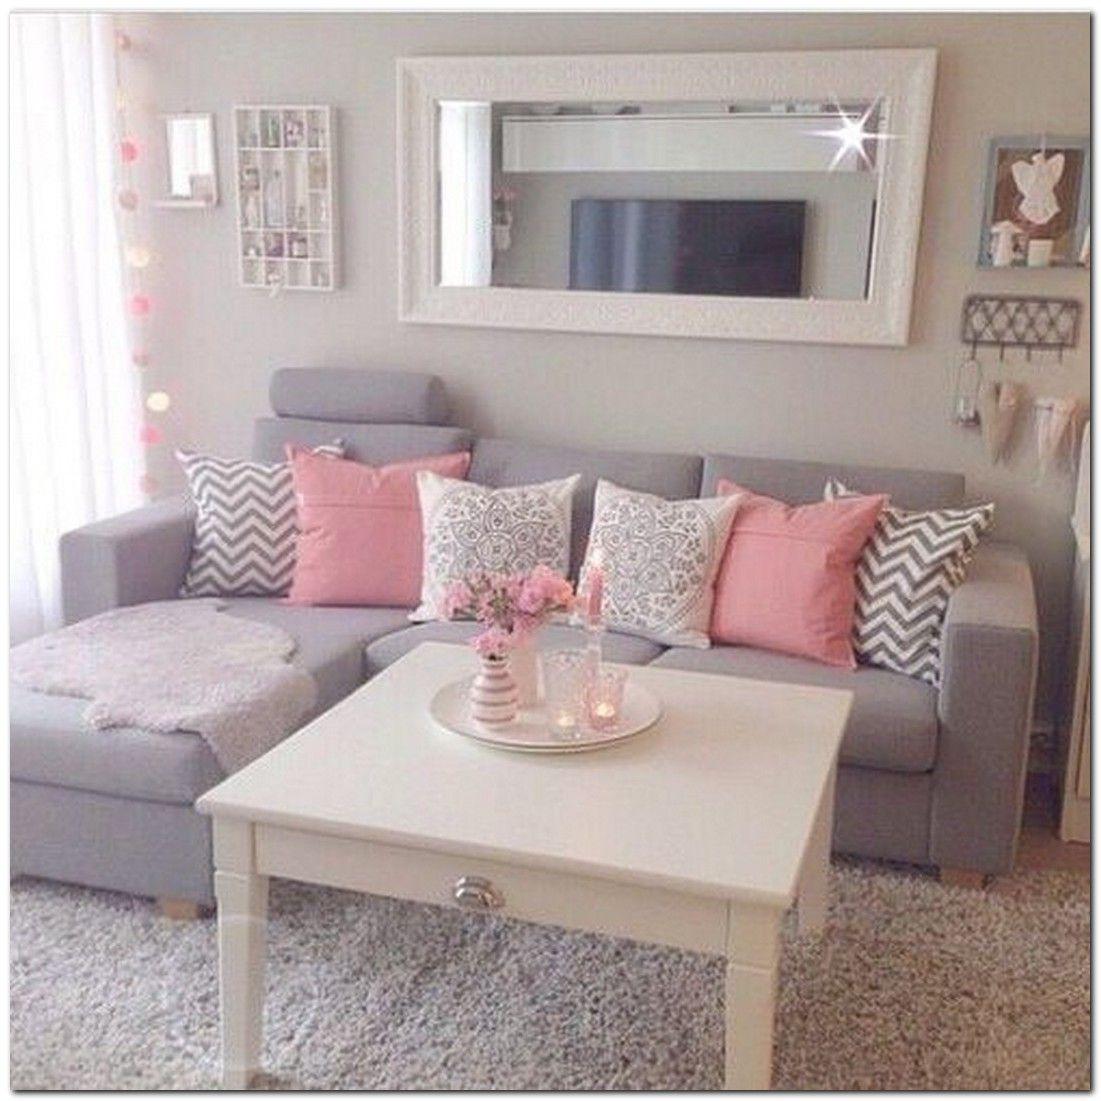 How to Decorating Small Apartment Ideas on Budget | Wohnzimmer und Neuer